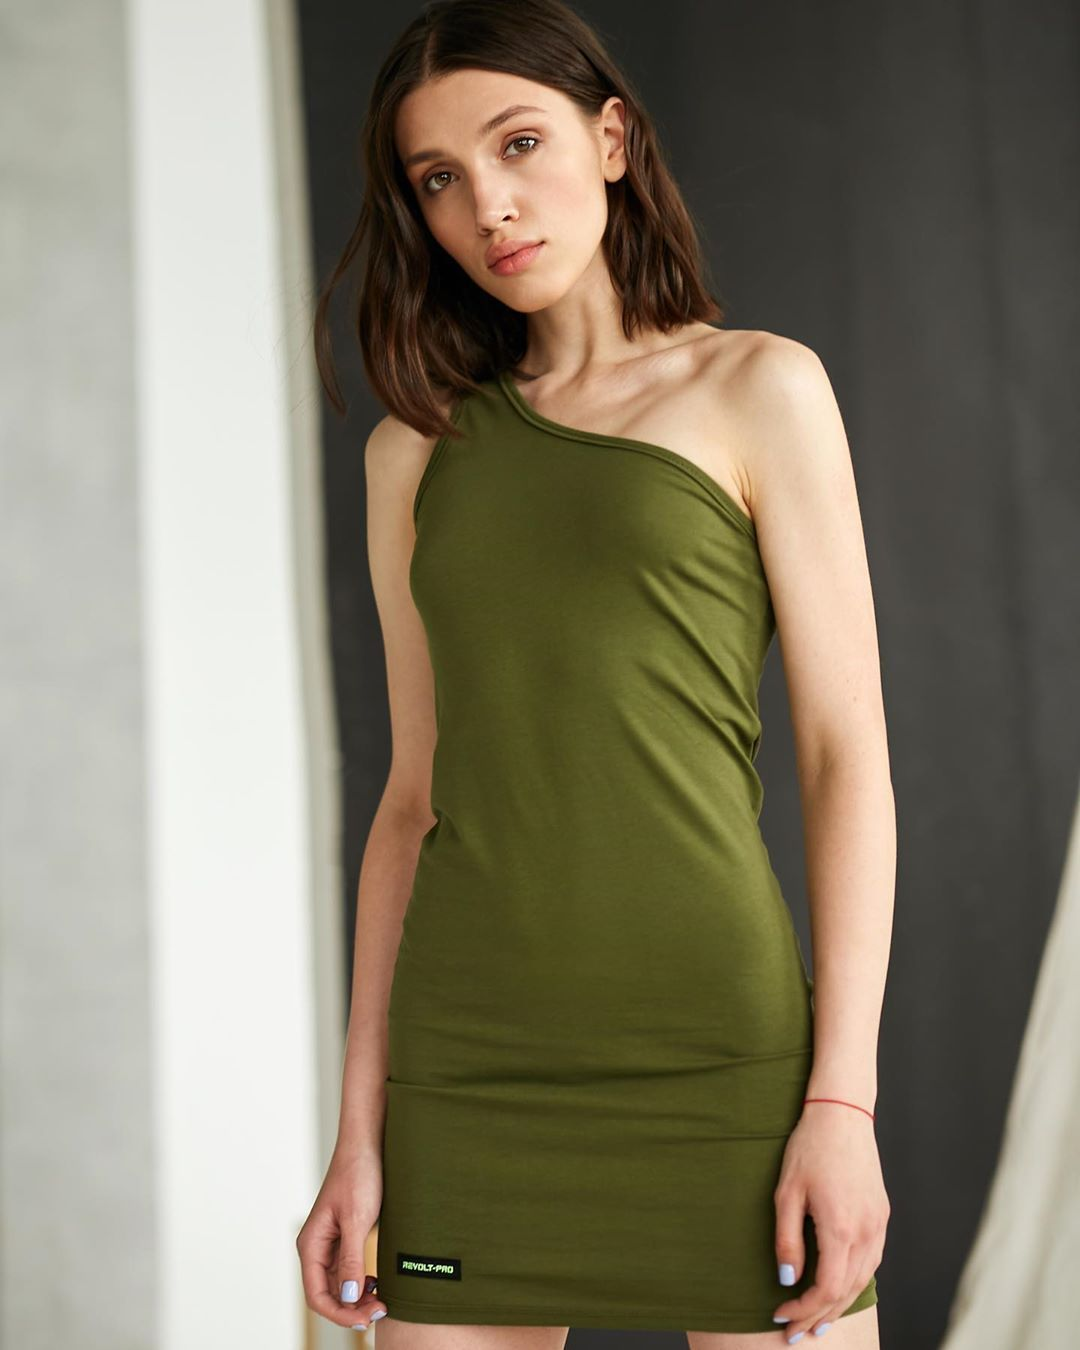 #fitnesswear #streetstyle #urbanstyle #revoltwear #designers #shoulder #designer #fitness #colors #s...